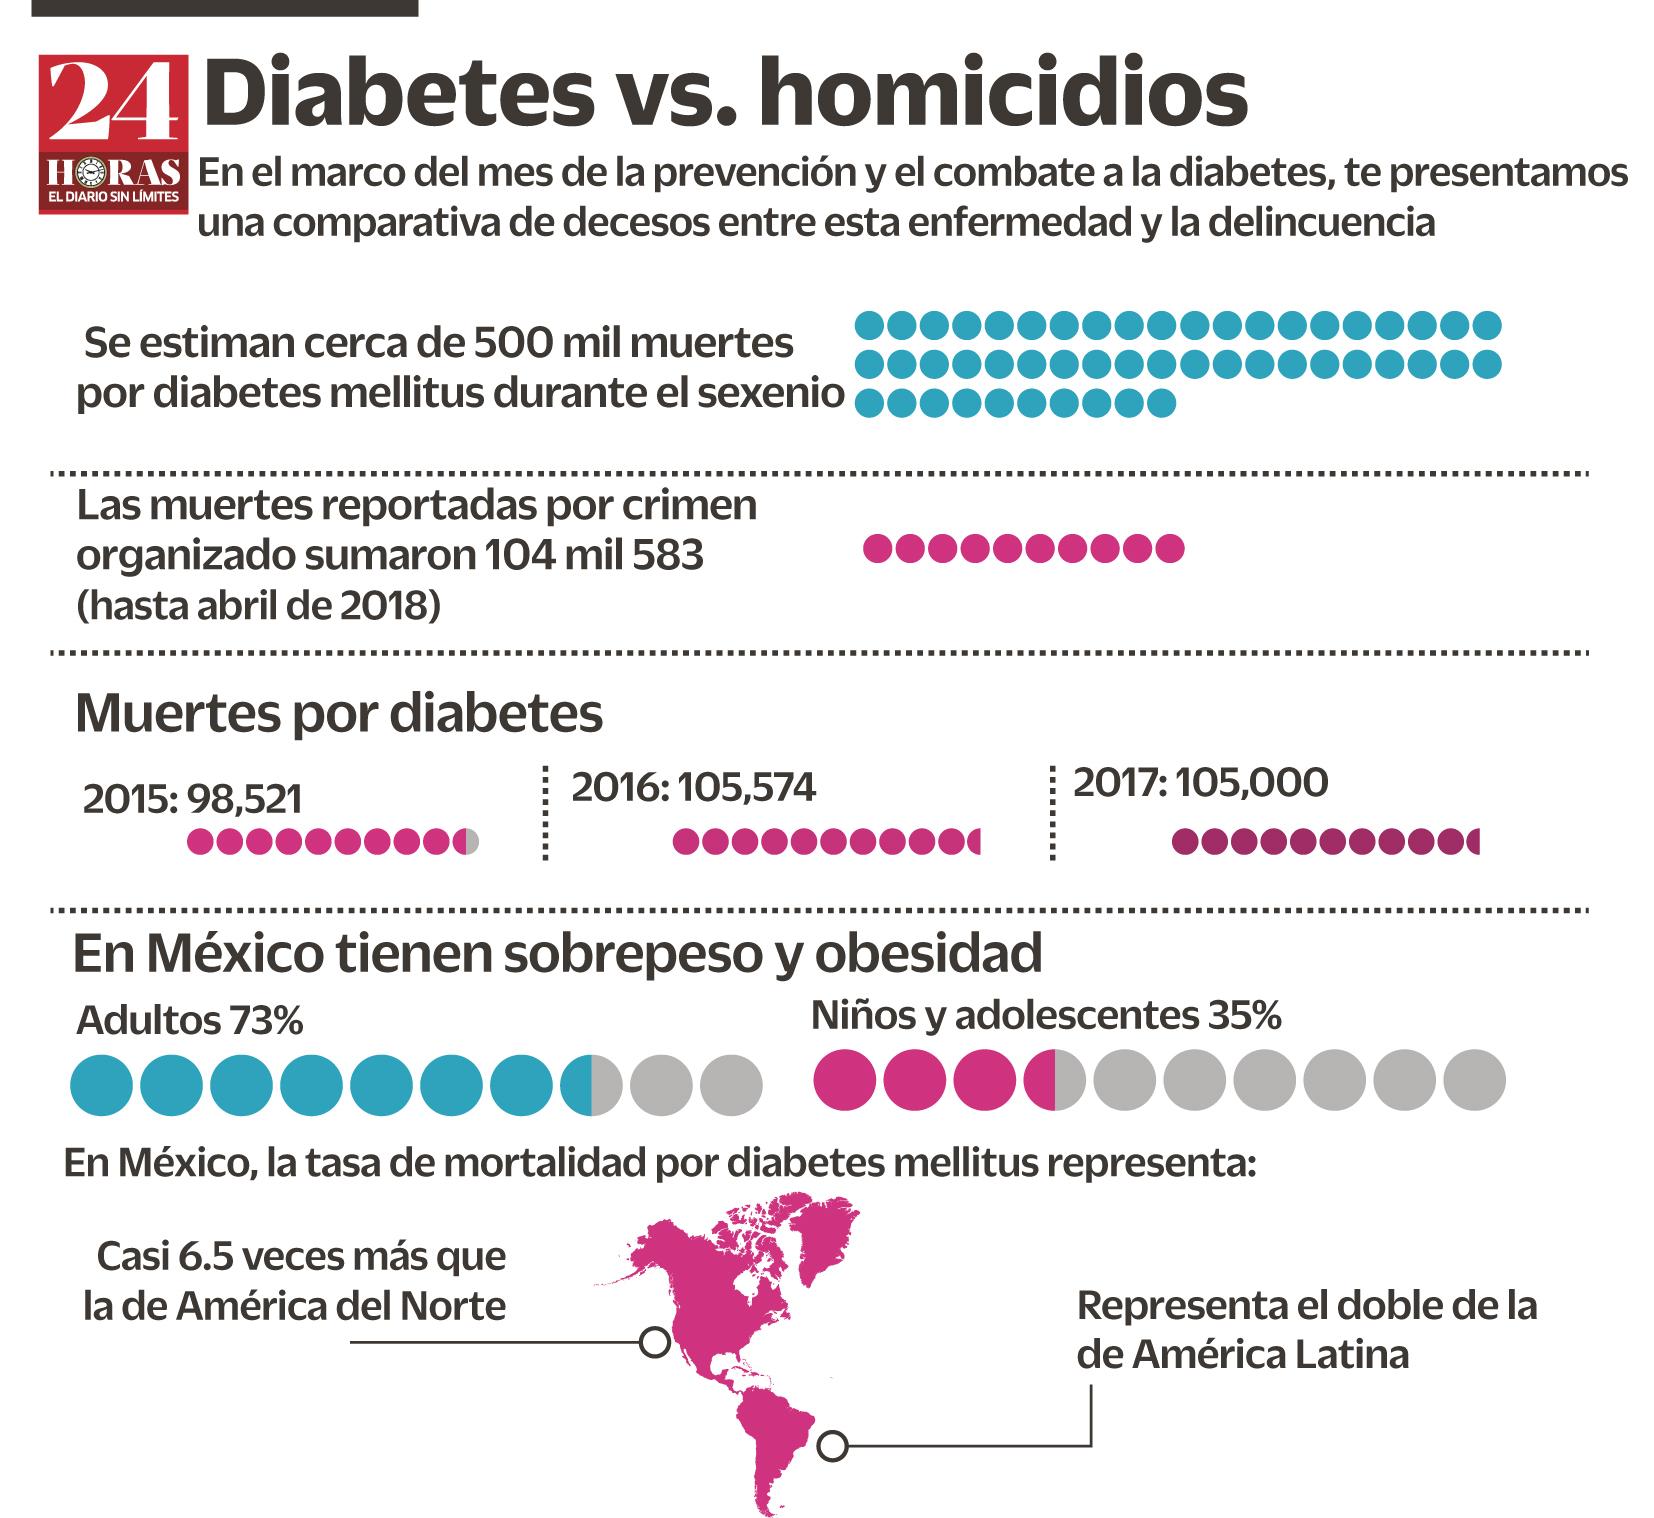 muertes por diabetes en américa